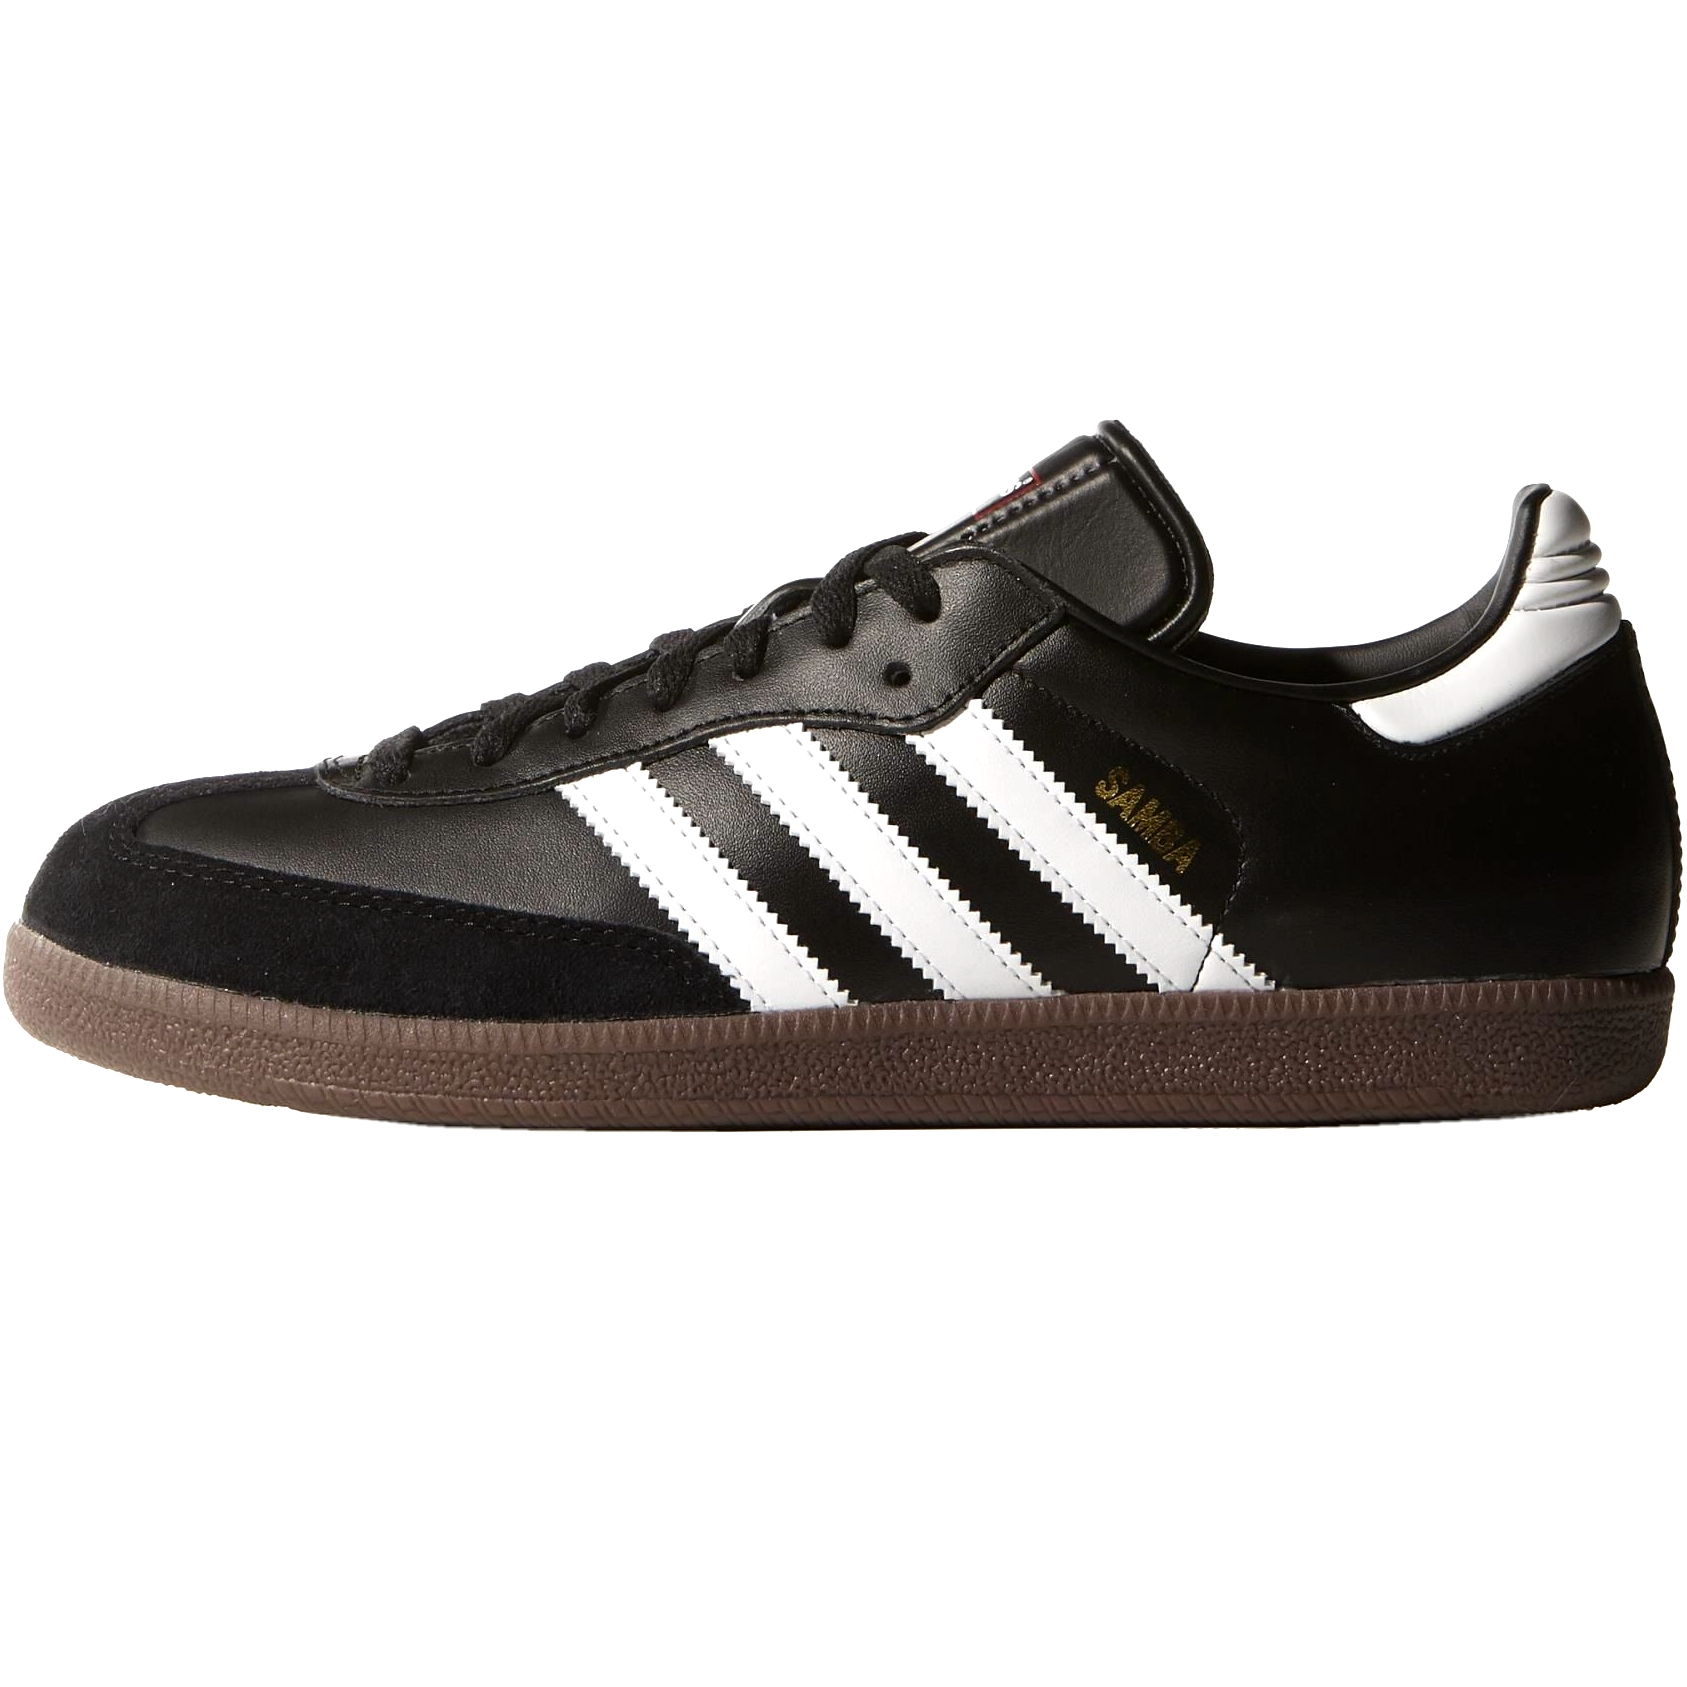 adidas samba classic schuhe turnschuhe sneaker herren schwarz 019000 ebay. Black Bedroom Furniture Sets. Home Design Ideas